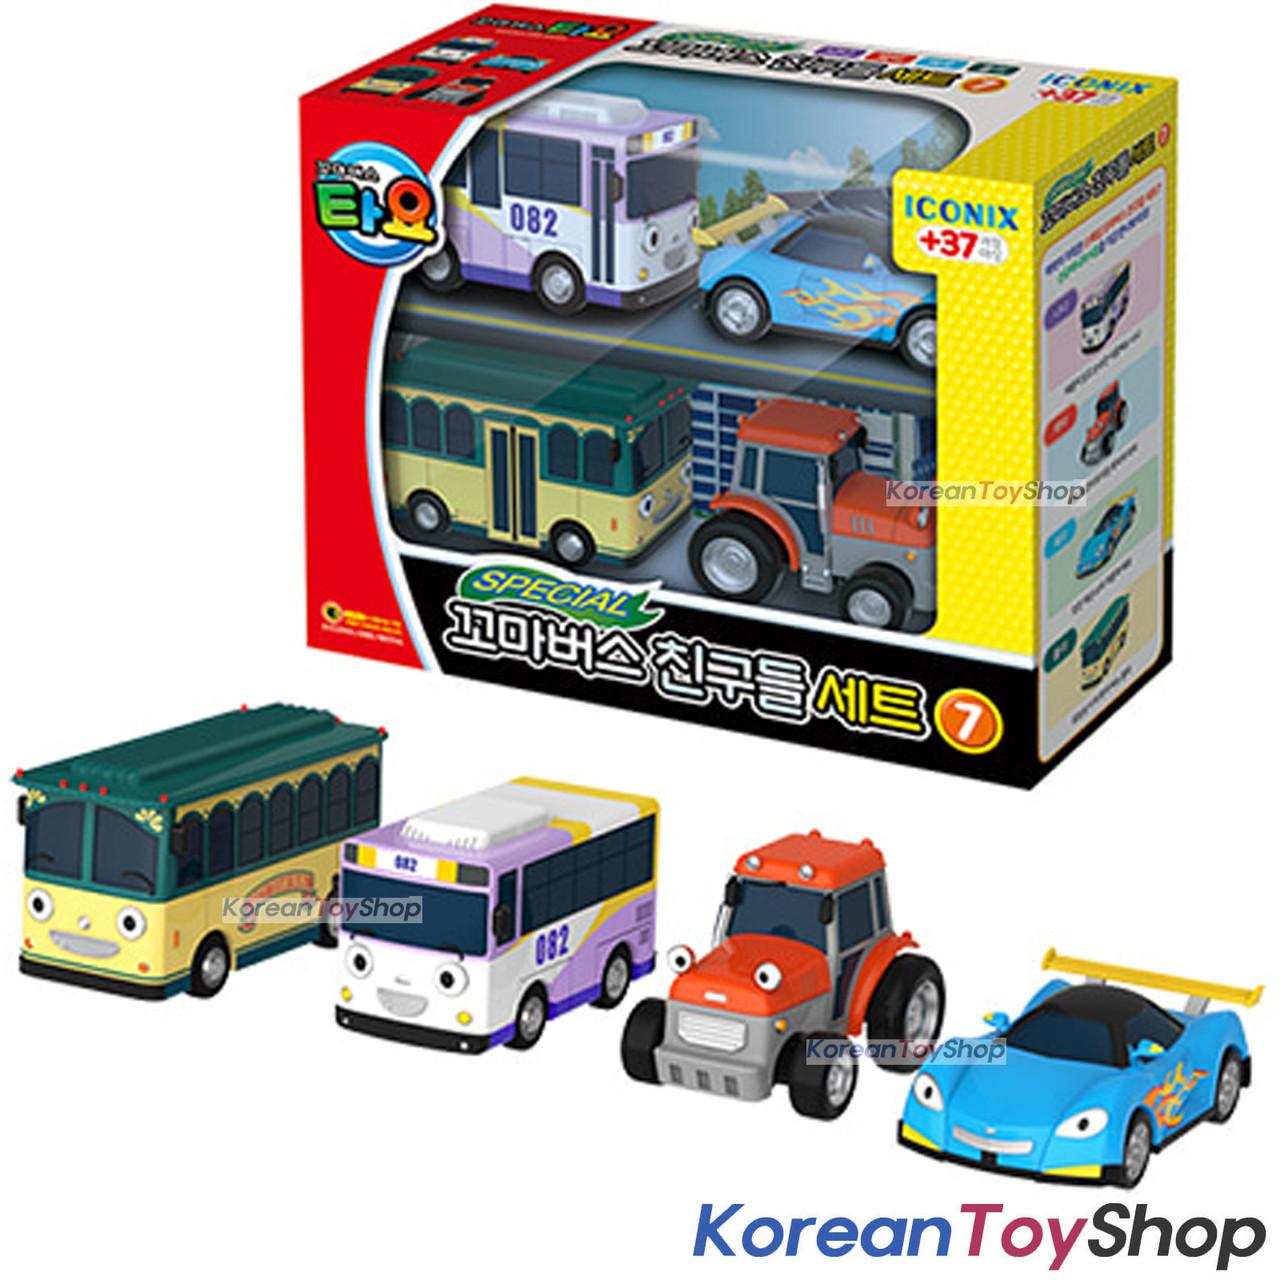 00171 Tayo Little Bus Friends Special V 7 Mini Car 4 Pcs Toy Set Nana Leo Rolly Ractor Koreantoyshop